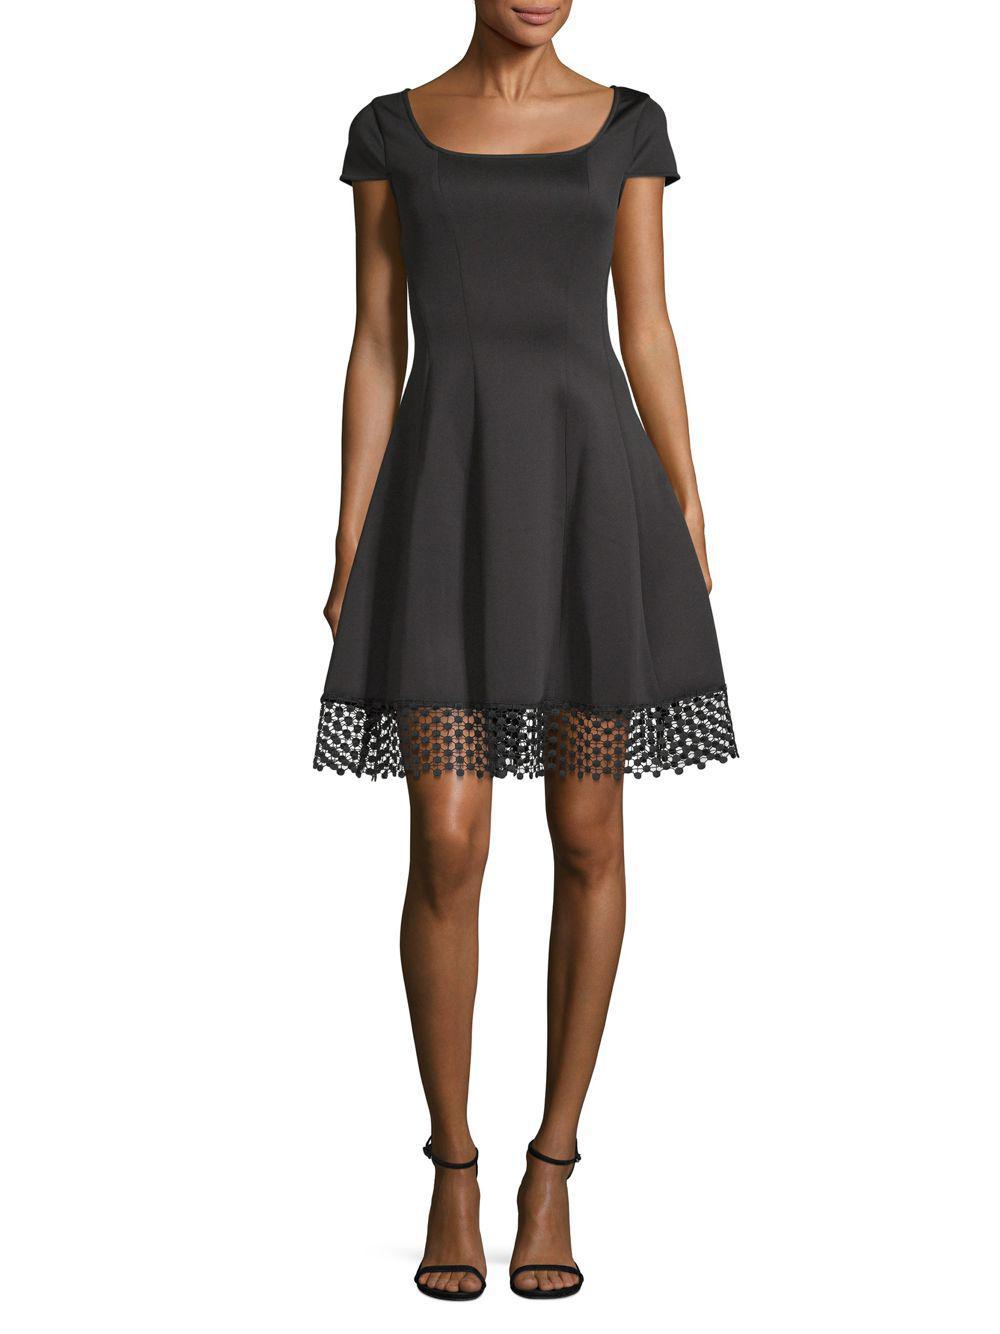 5a288f289d6a4 Donna Ricco Cap-sleeve Scuba Fit-&-flare Dress in Black - Lyst